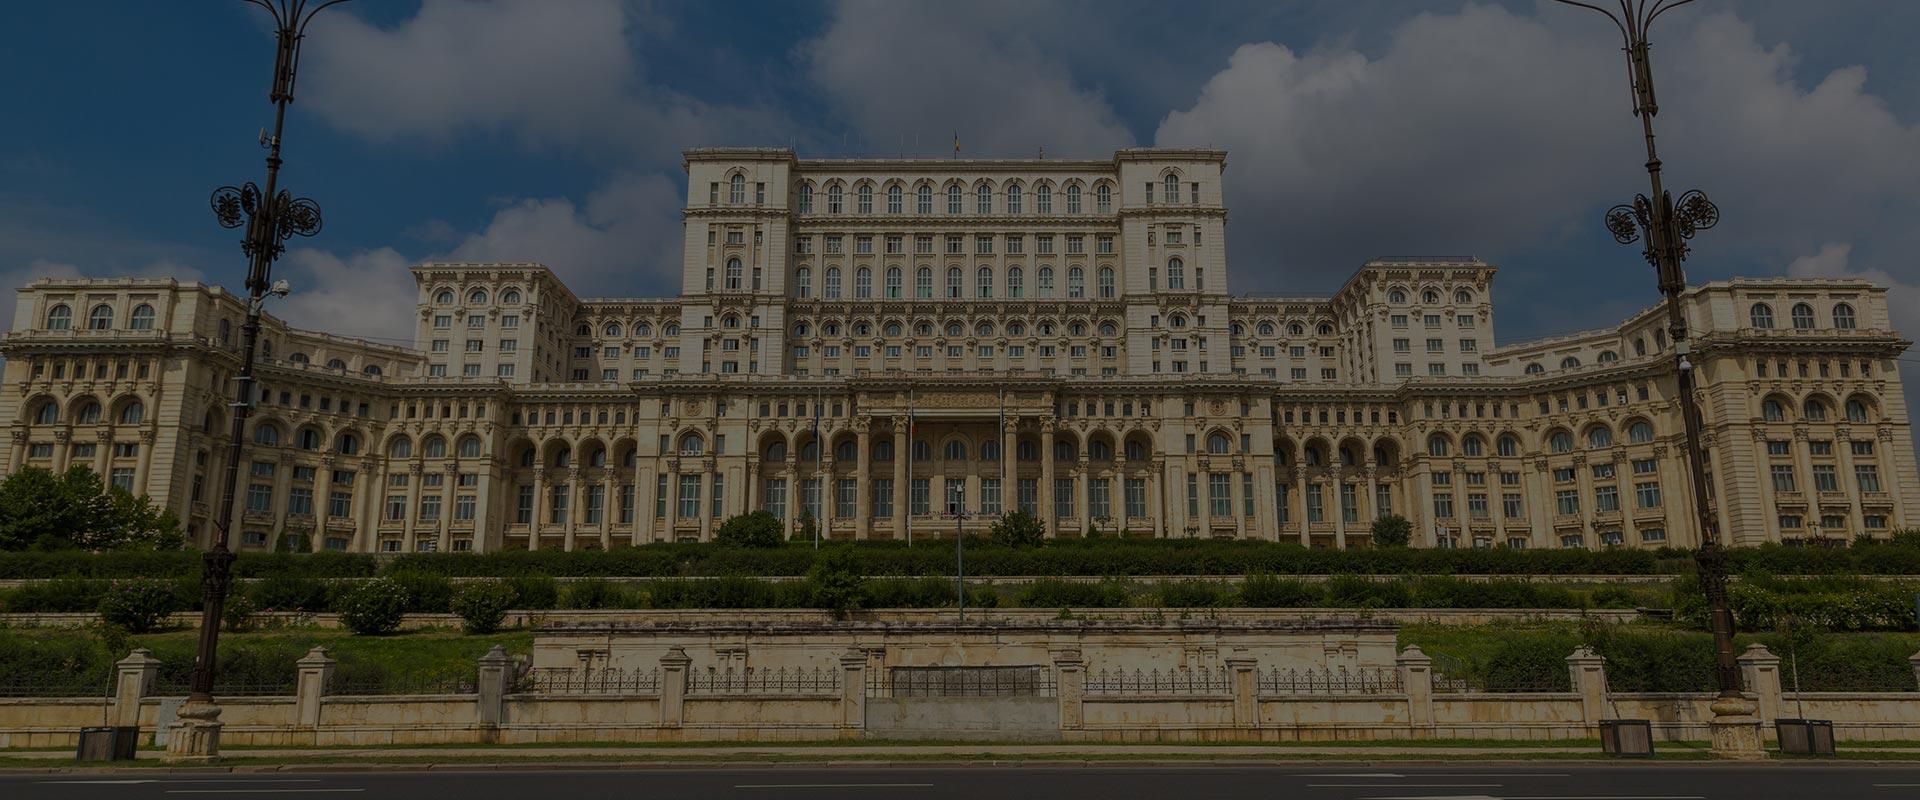 nceeer-homepage-slide-parliament-bucharest-romania